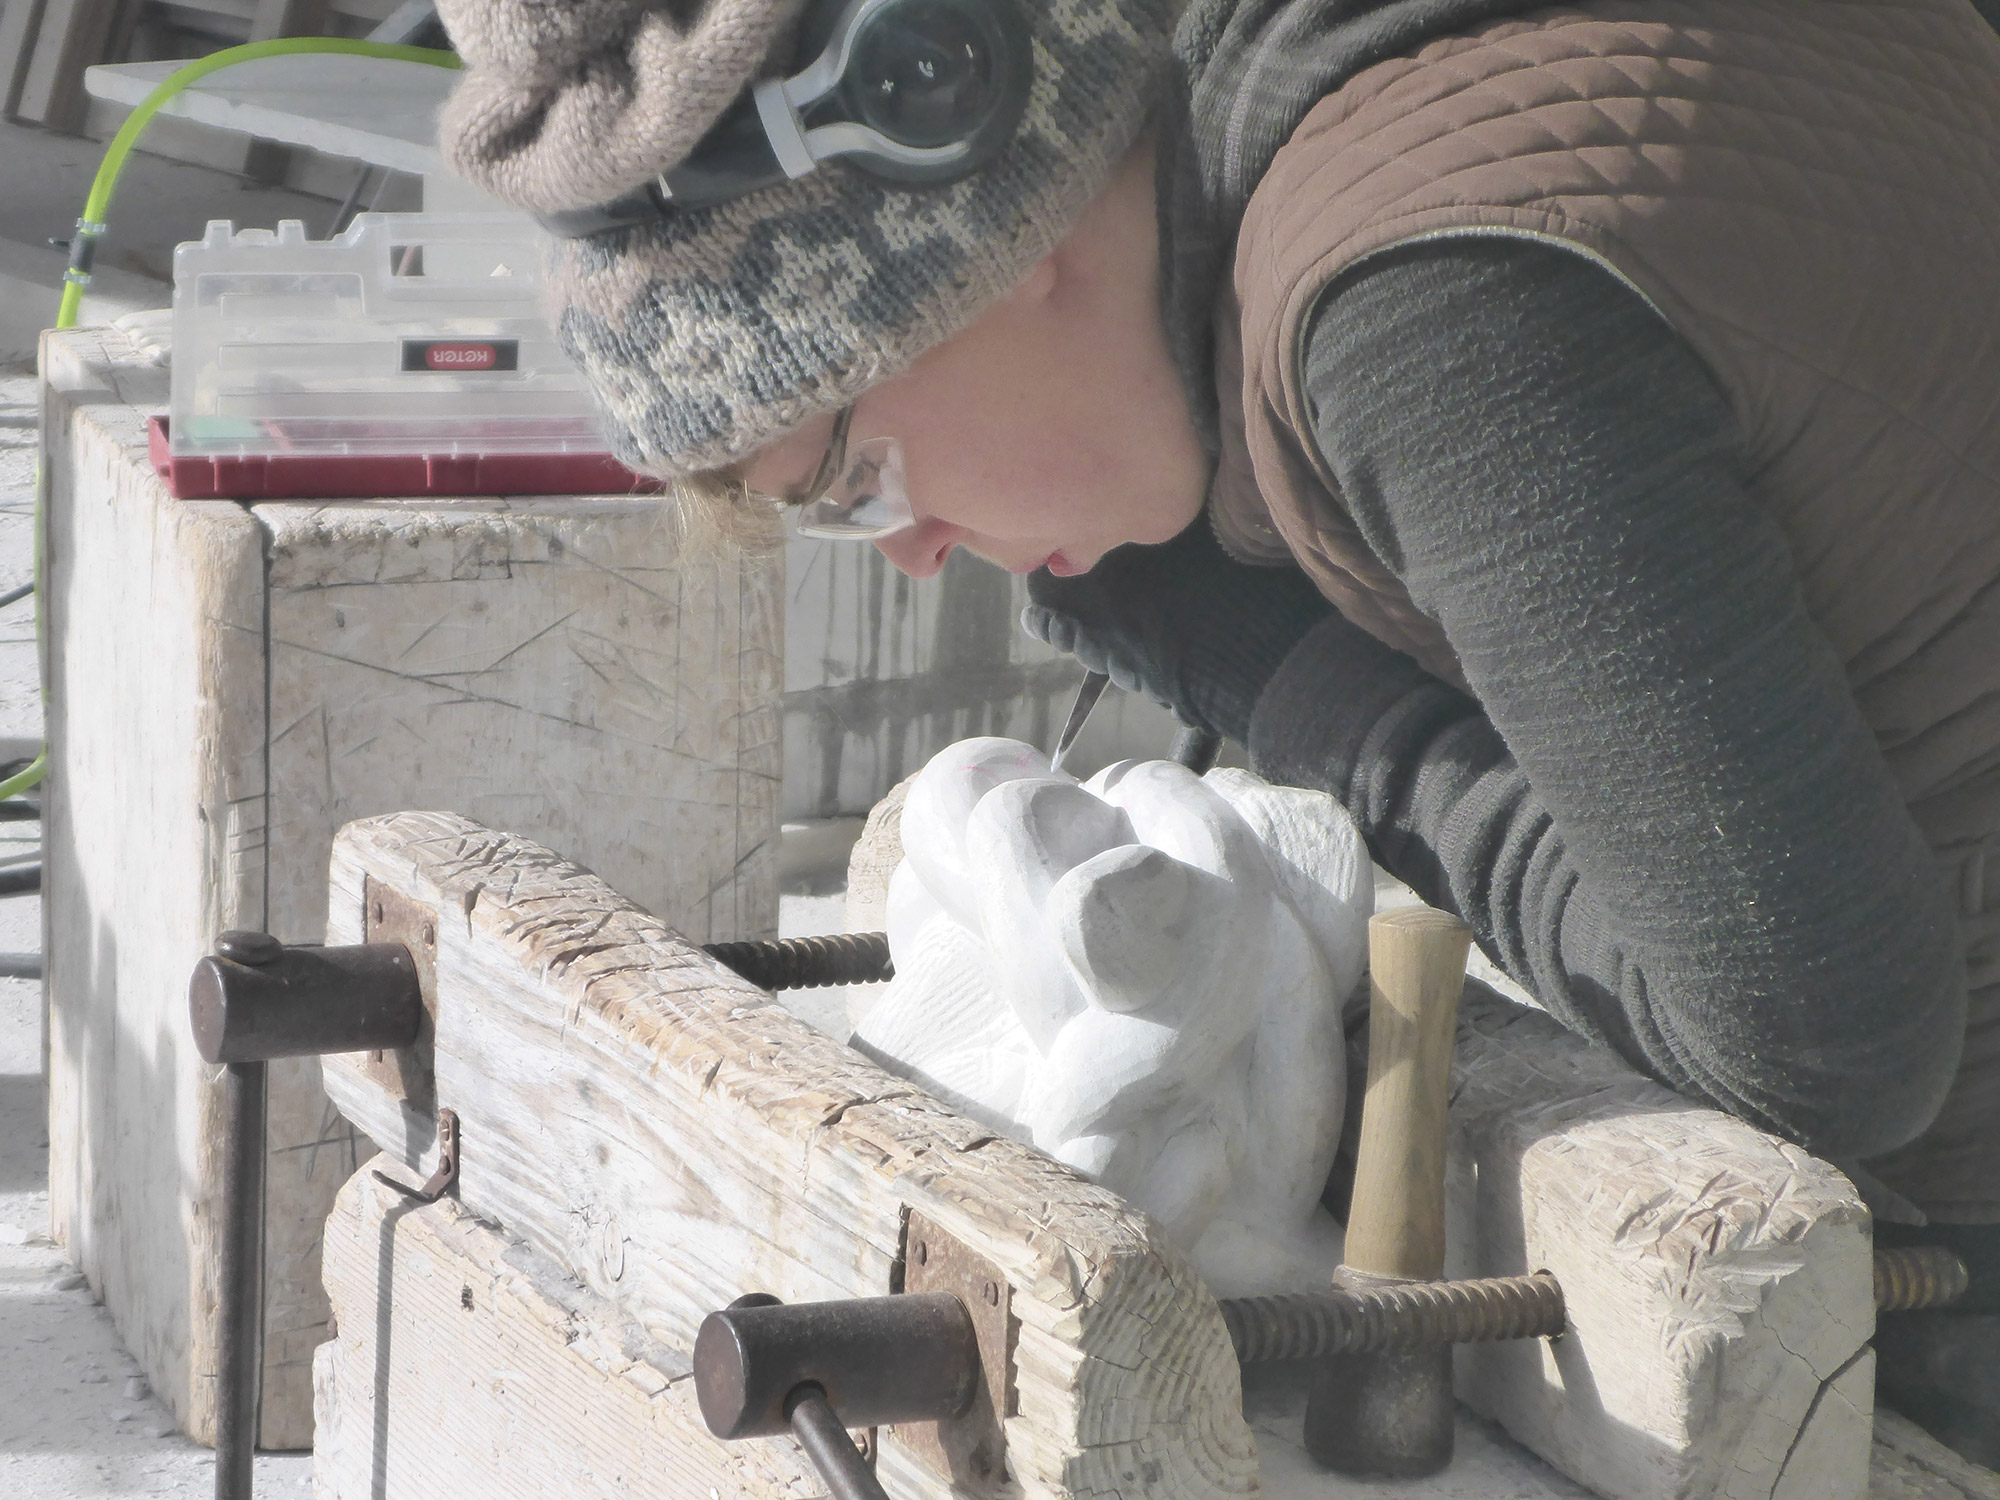 Mary-Beth-Gutkowski-Sculpture-Residency-Amelia-Kate-Sampson-and-Elizabeth-Hardy20171213_0211.jpg